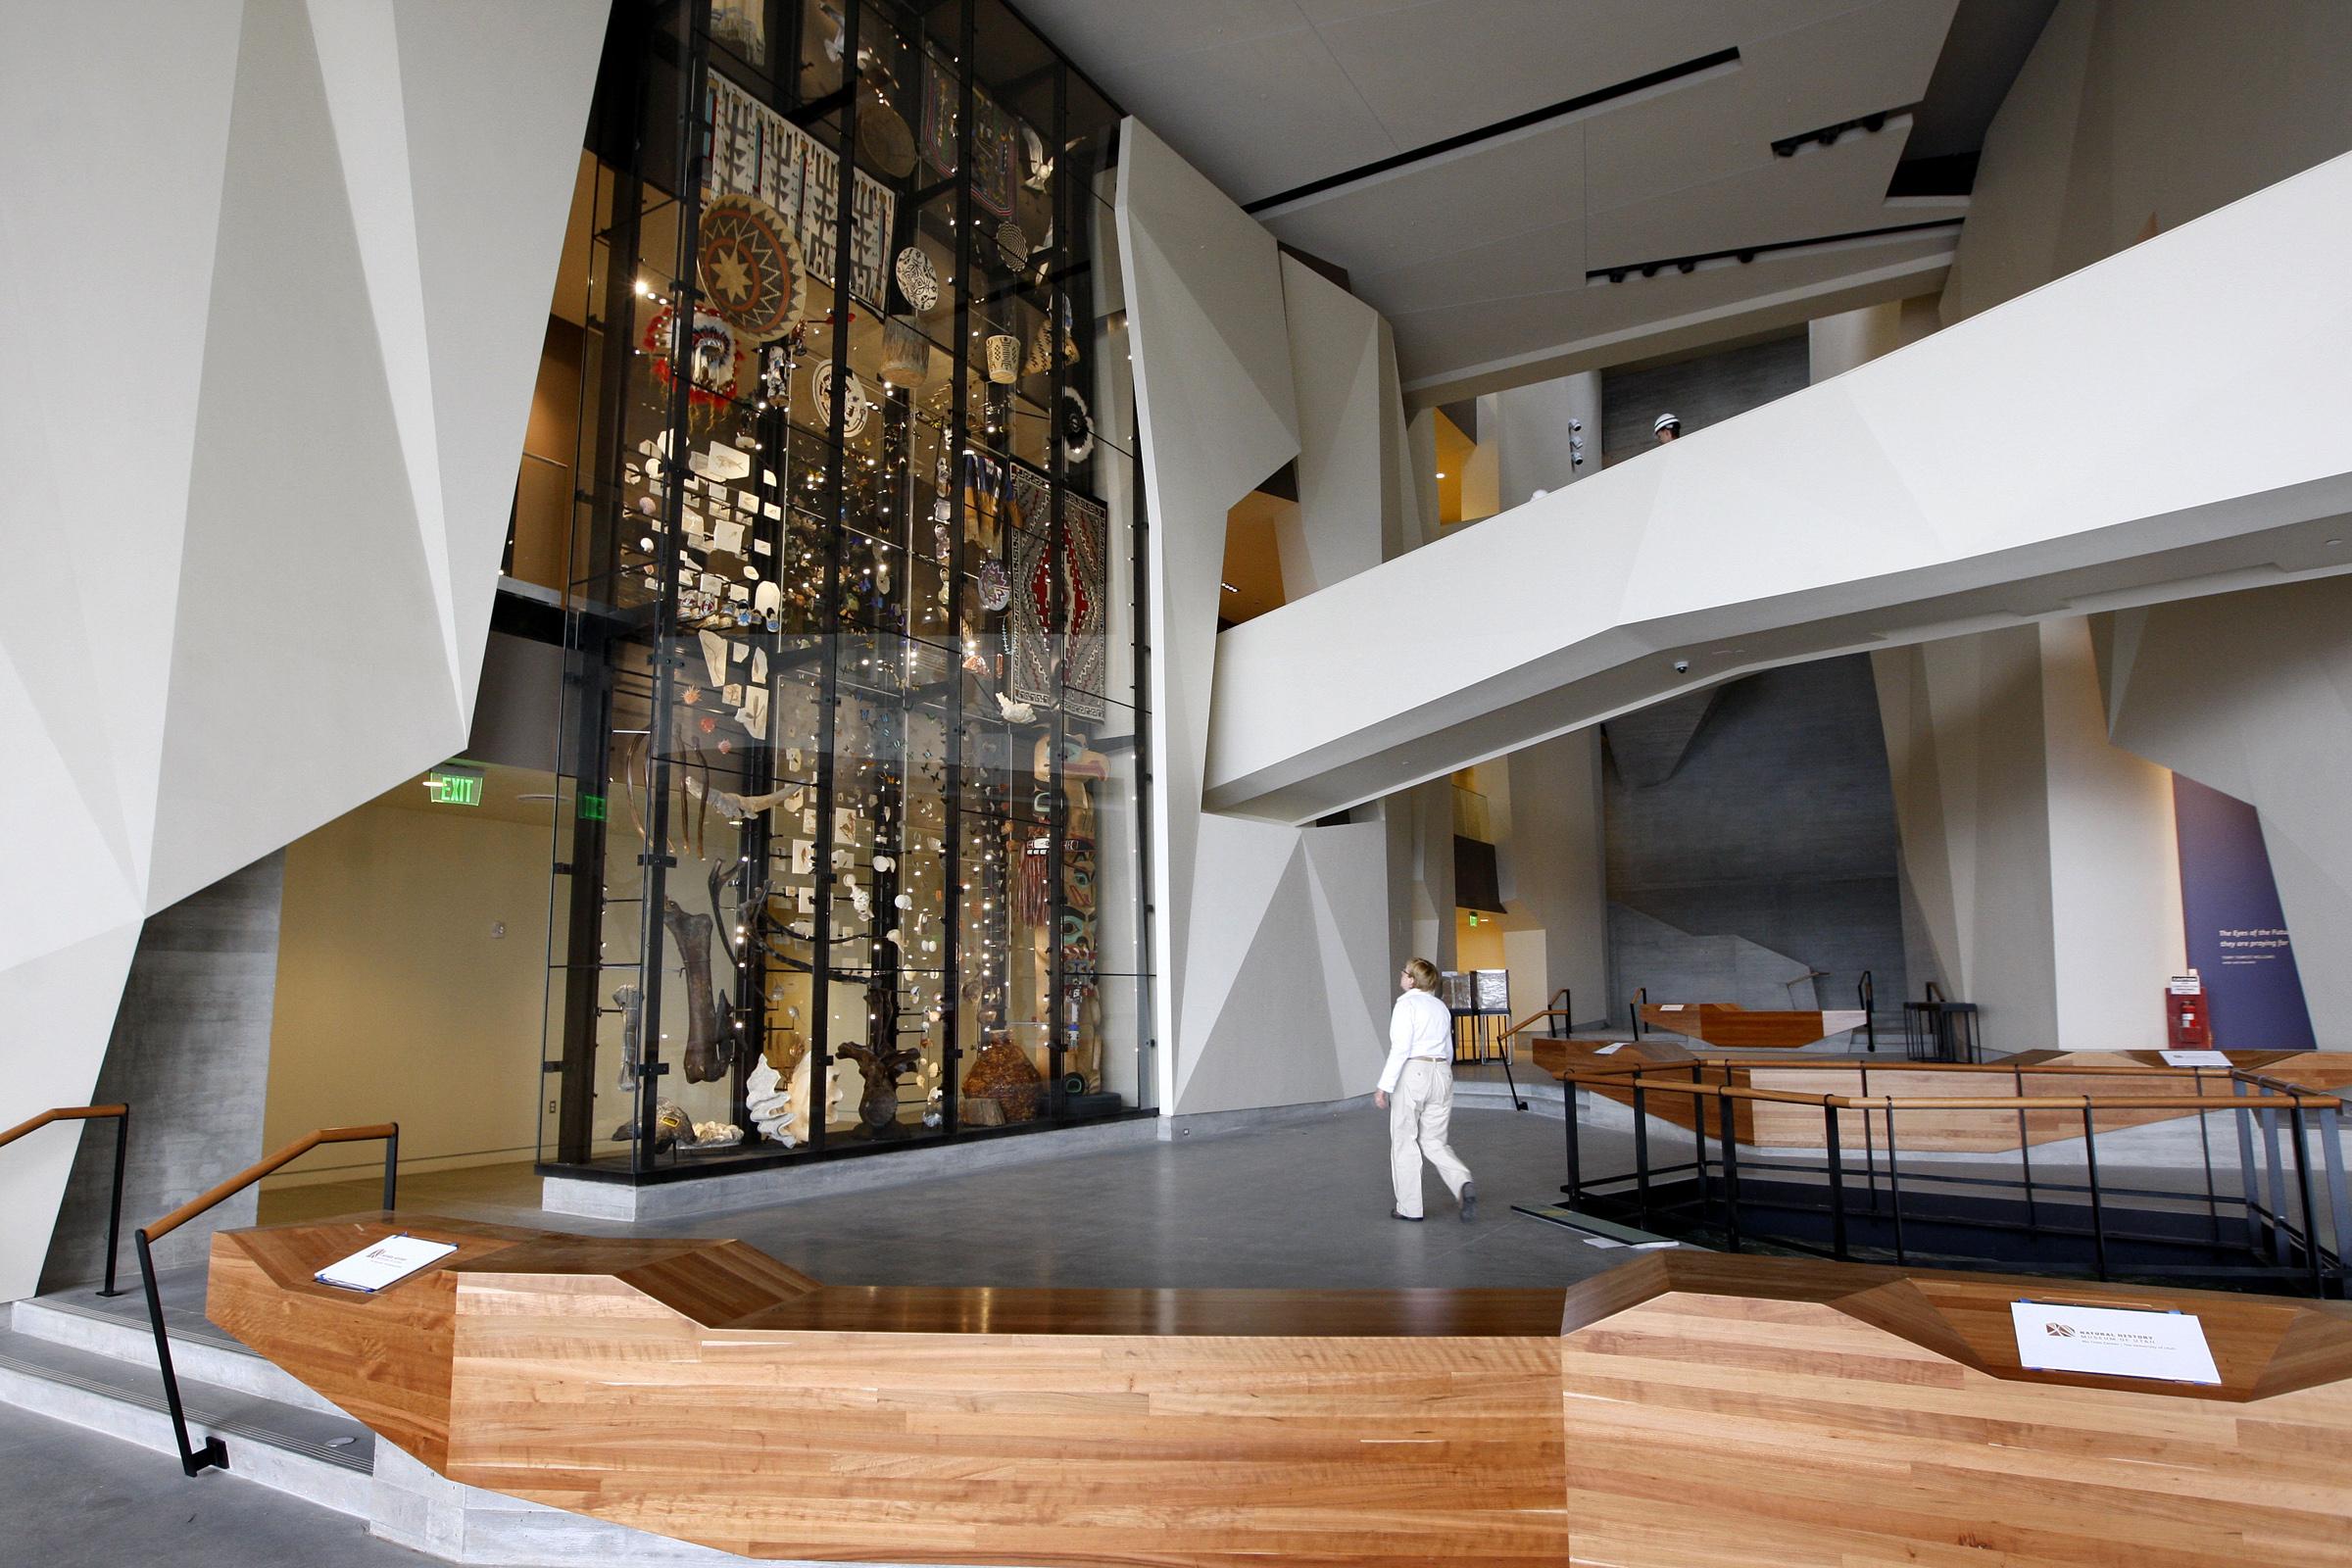 Main lobby at the Natural History Museum of Utah.